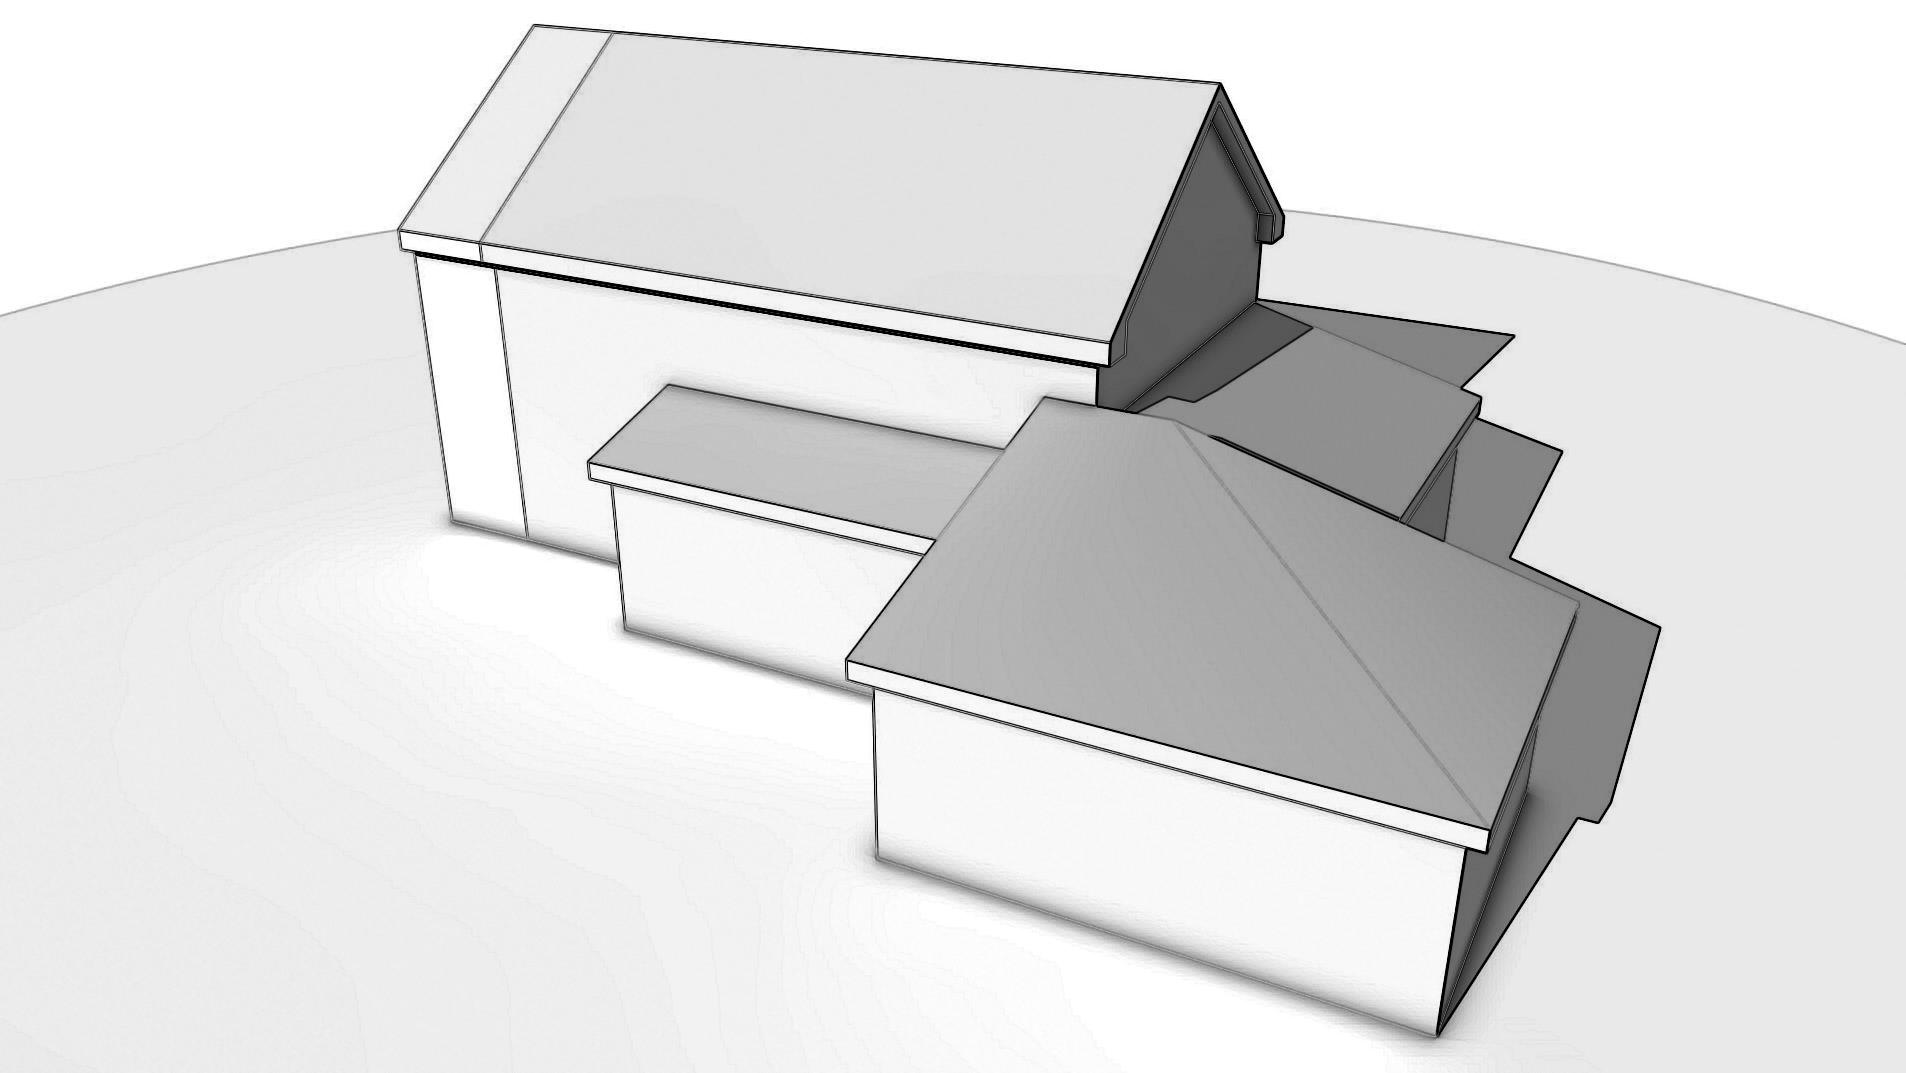 Roofline5-d.jpg